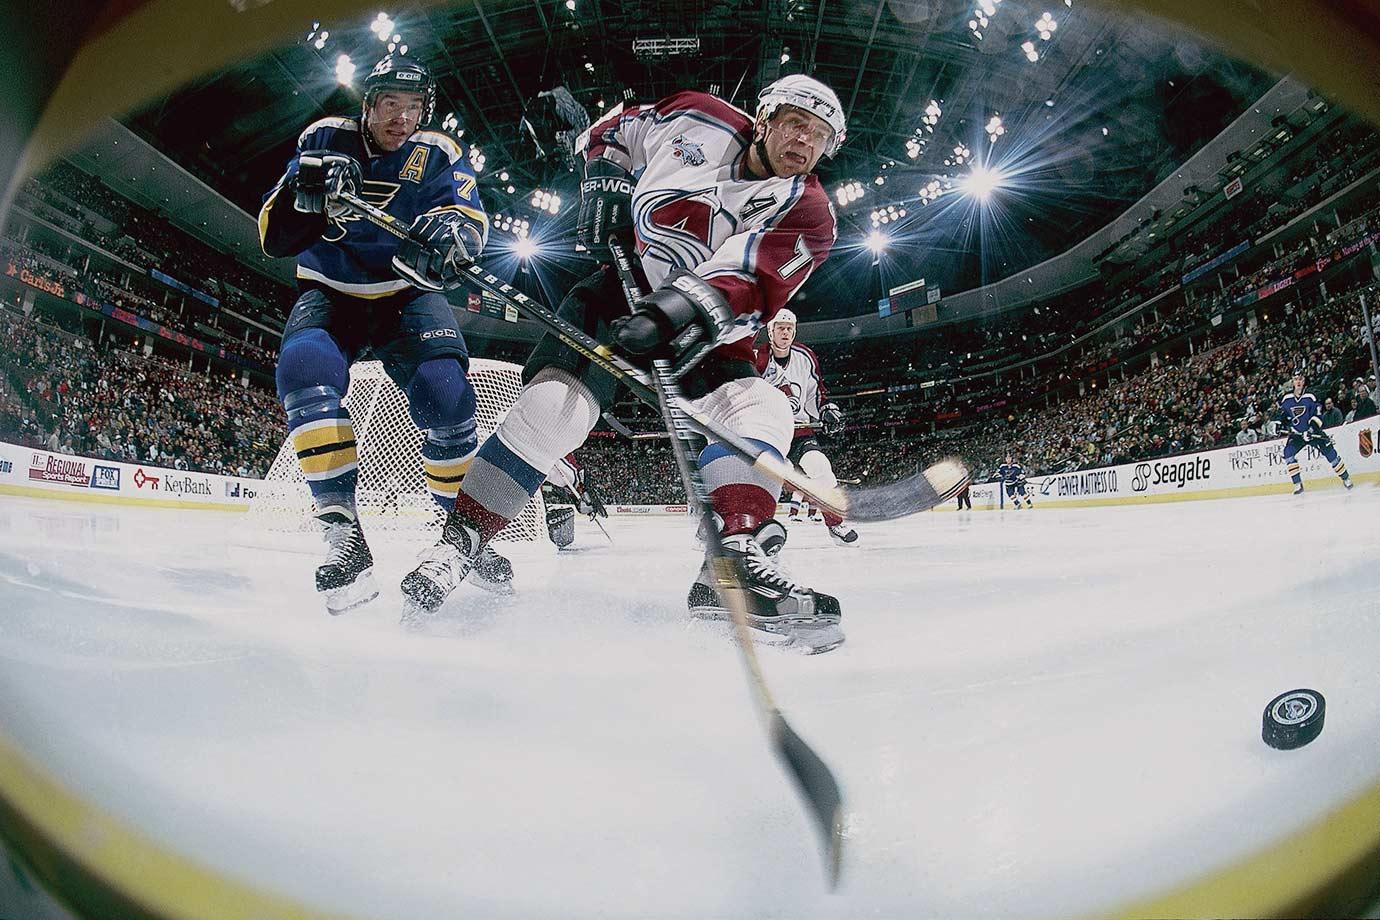 Feb. 10, 2001 — Colorado Avalanche vs. St. Louis Blues